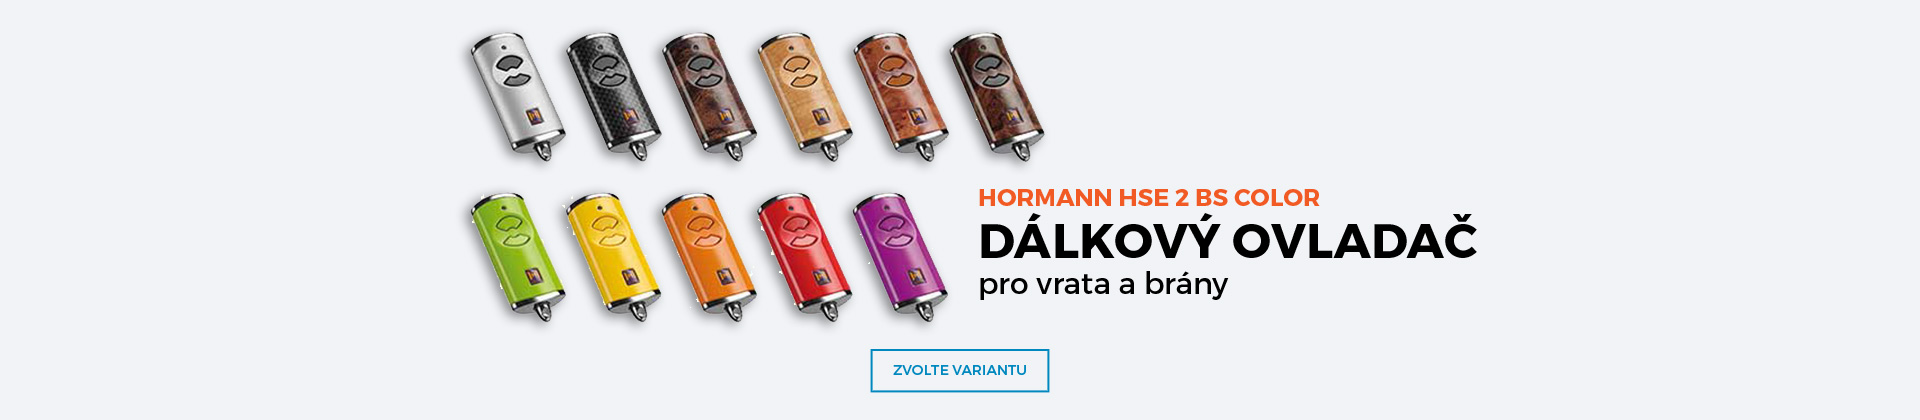 HSE 2 BS Color